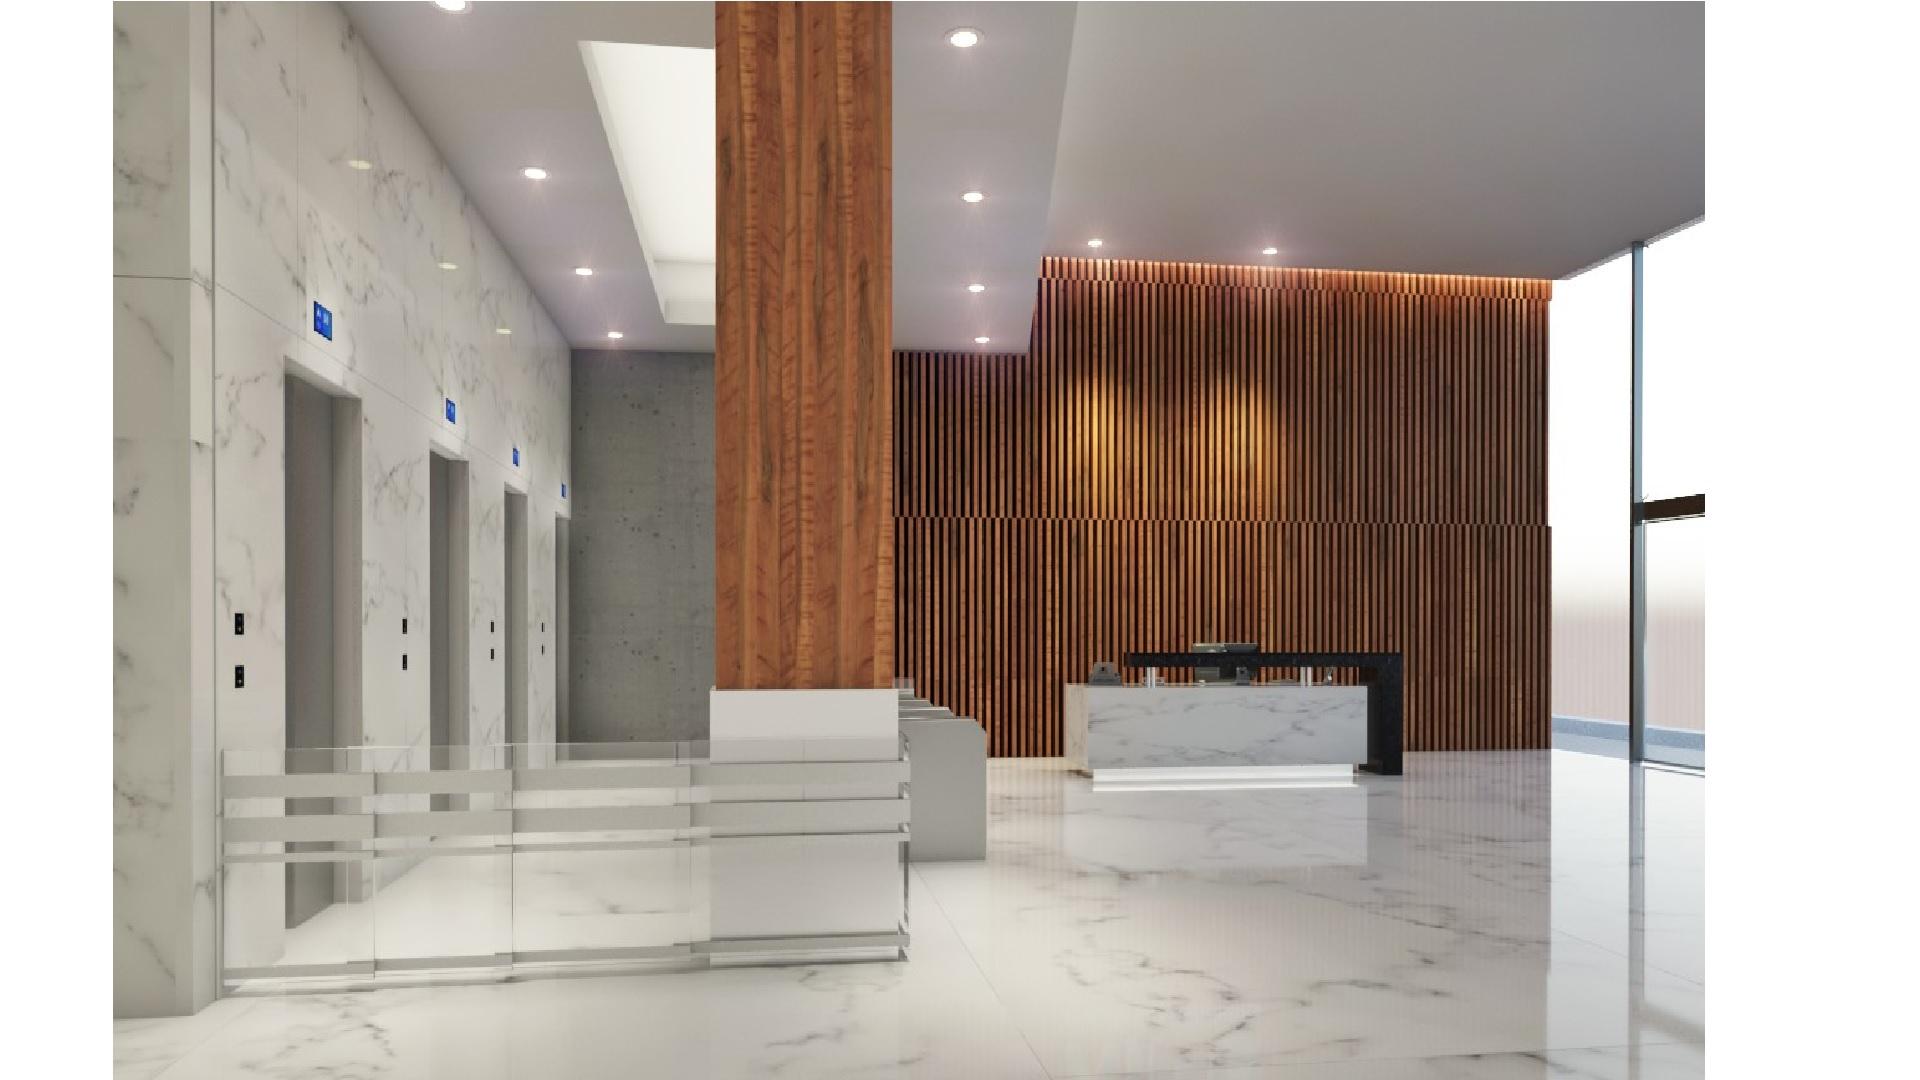 Lobby Atlantic Oficinas barranquilla 1 w